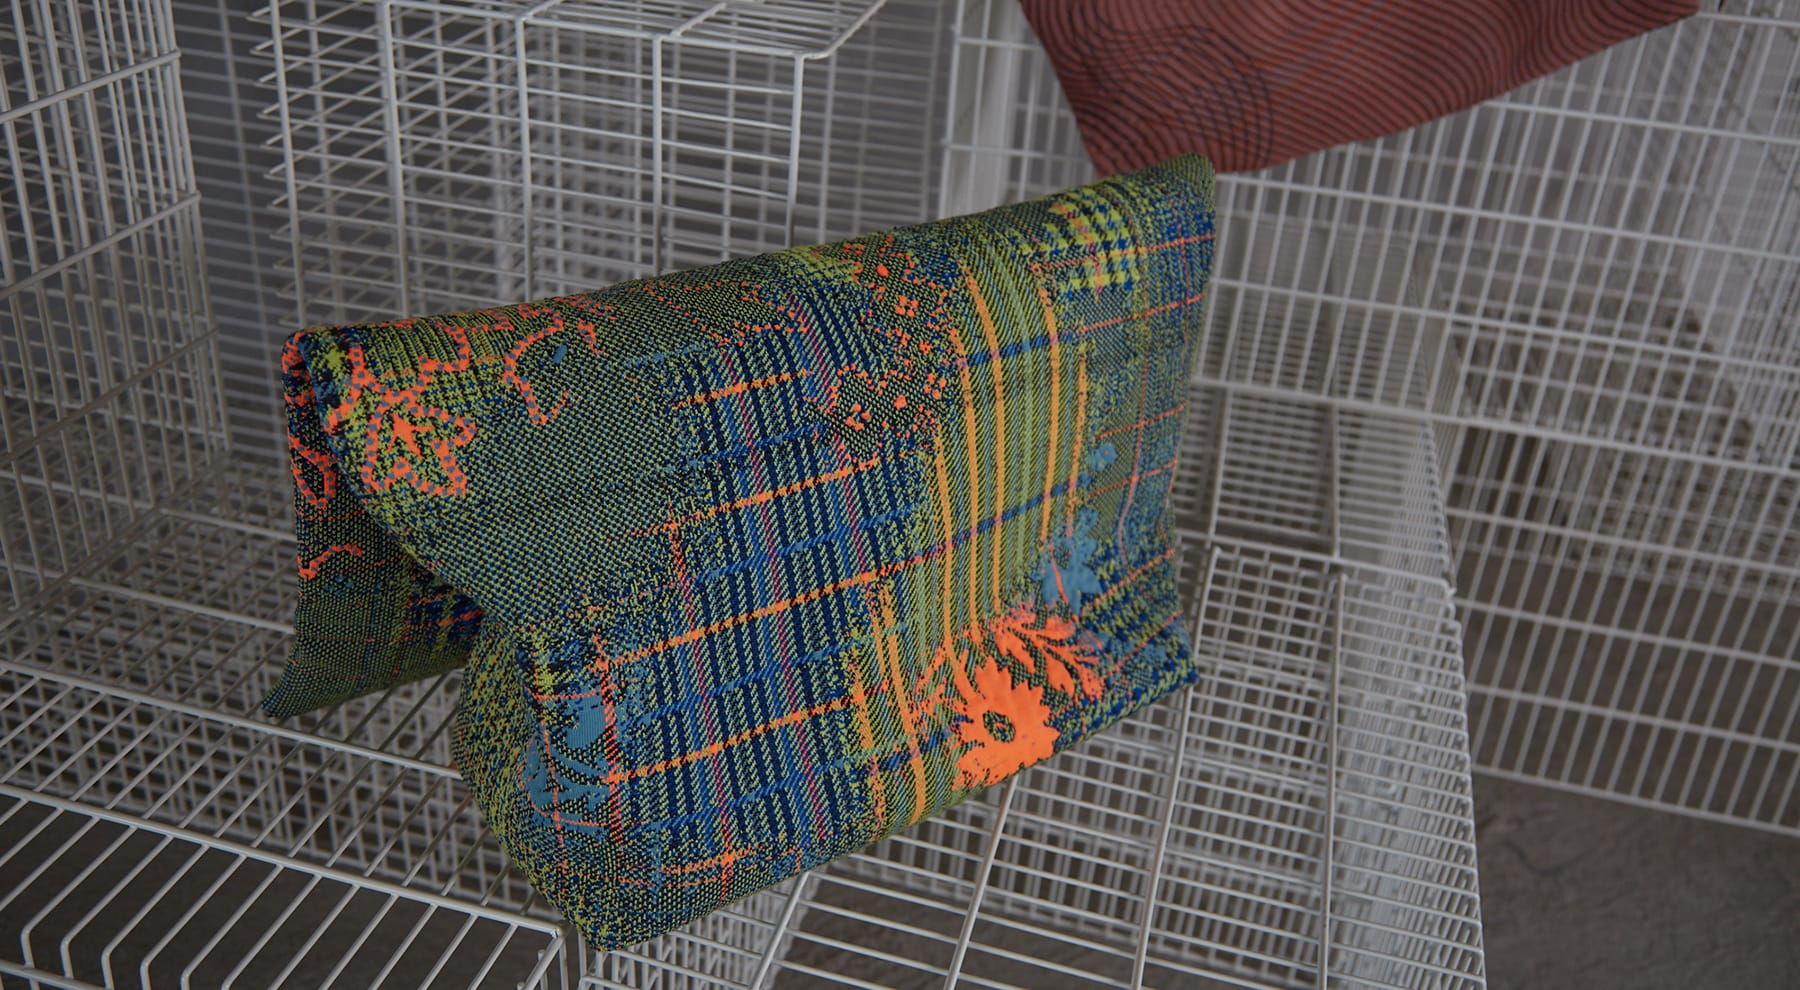 Start Santoni knit textiles